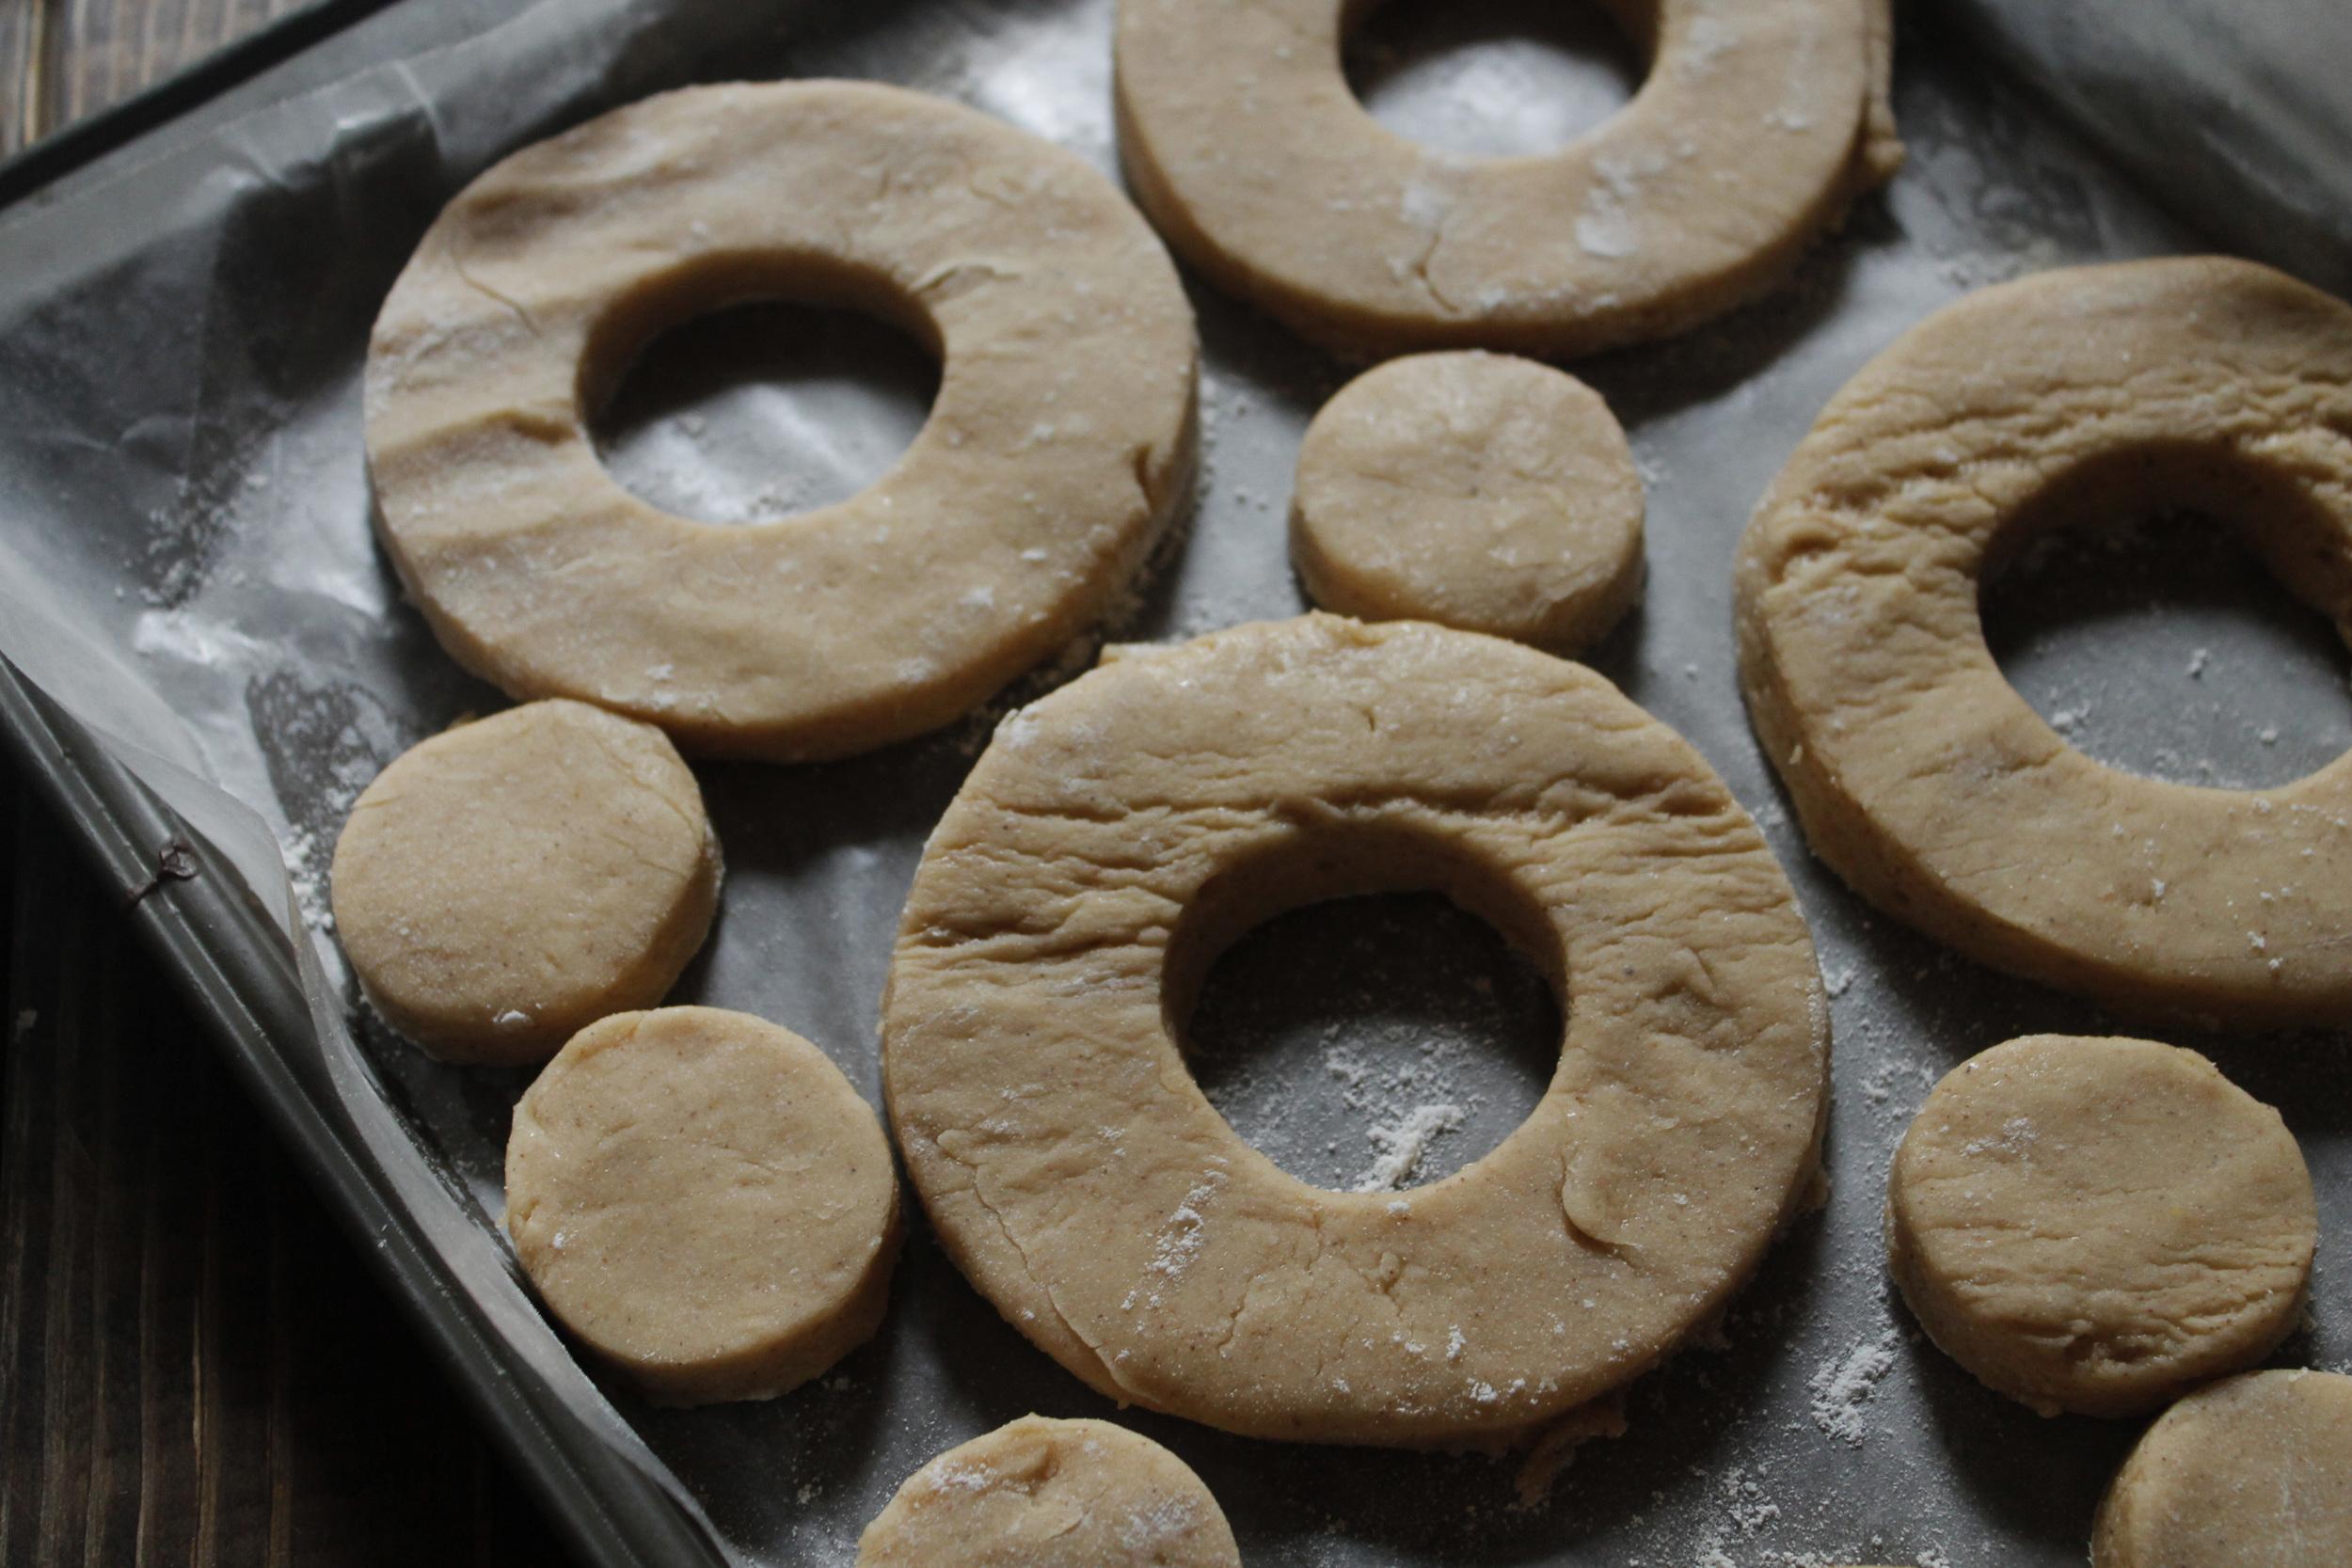 apple cider donuts 6.jpg